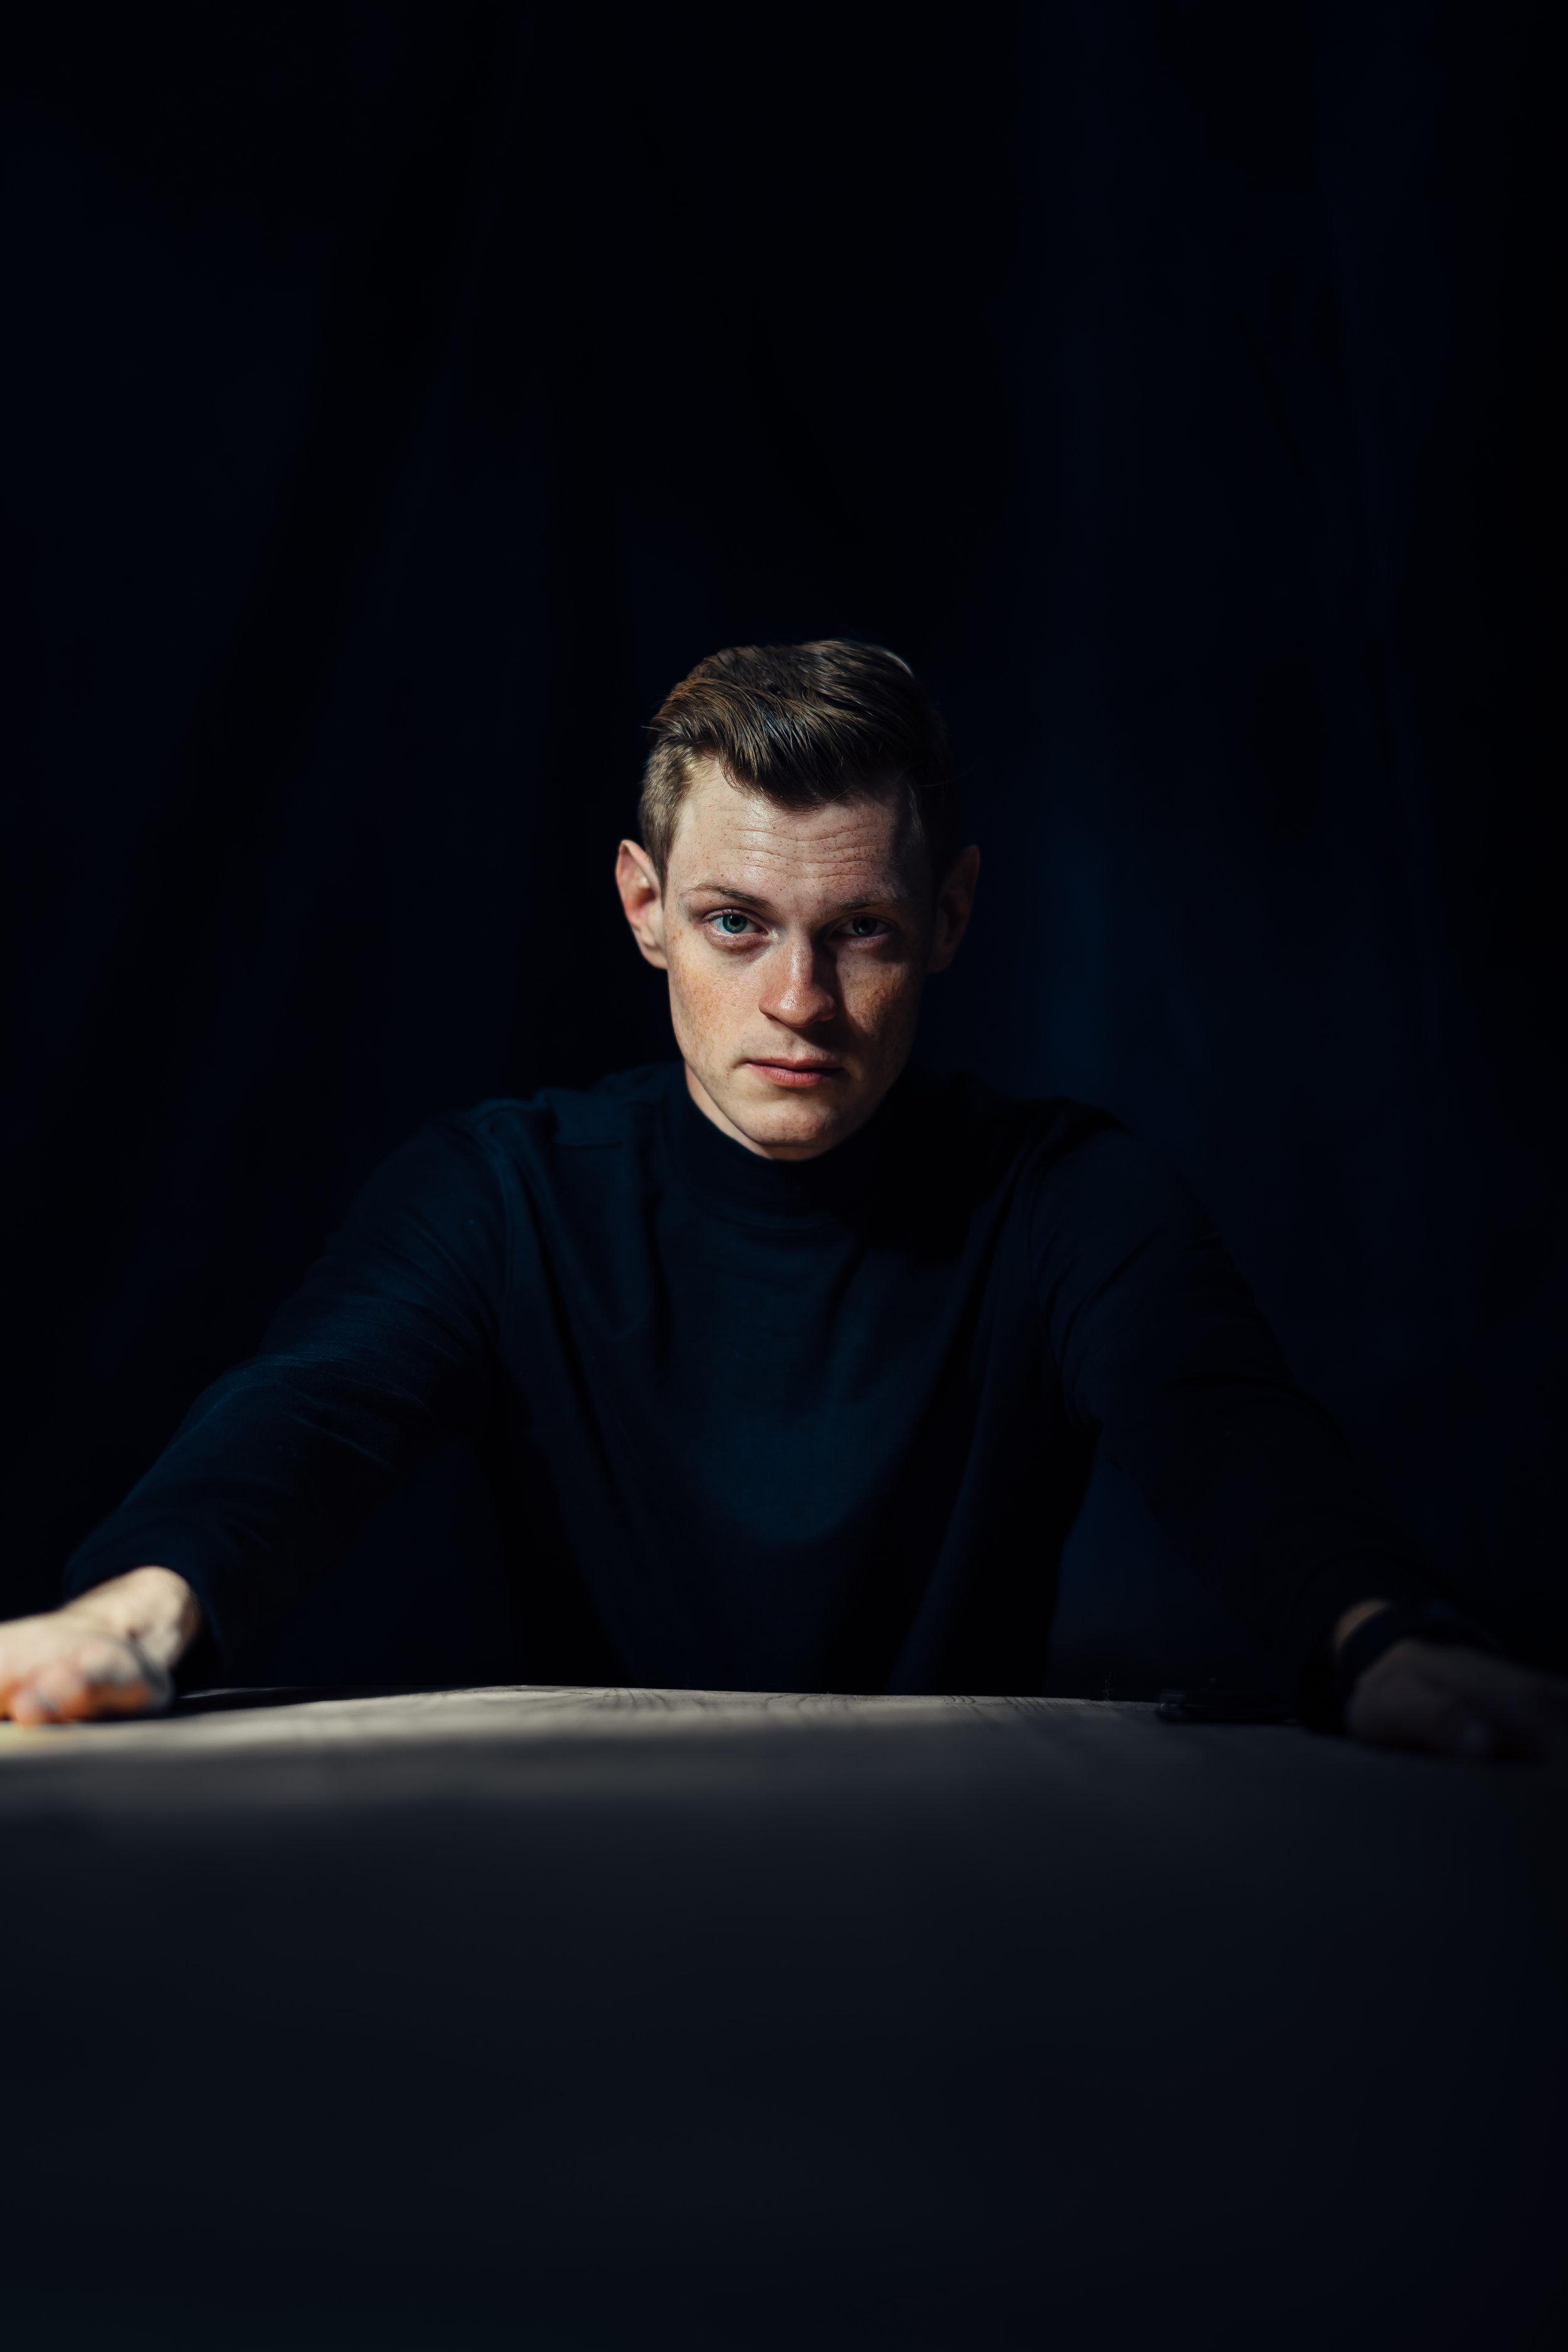 Jasan Matthuews: Portraits